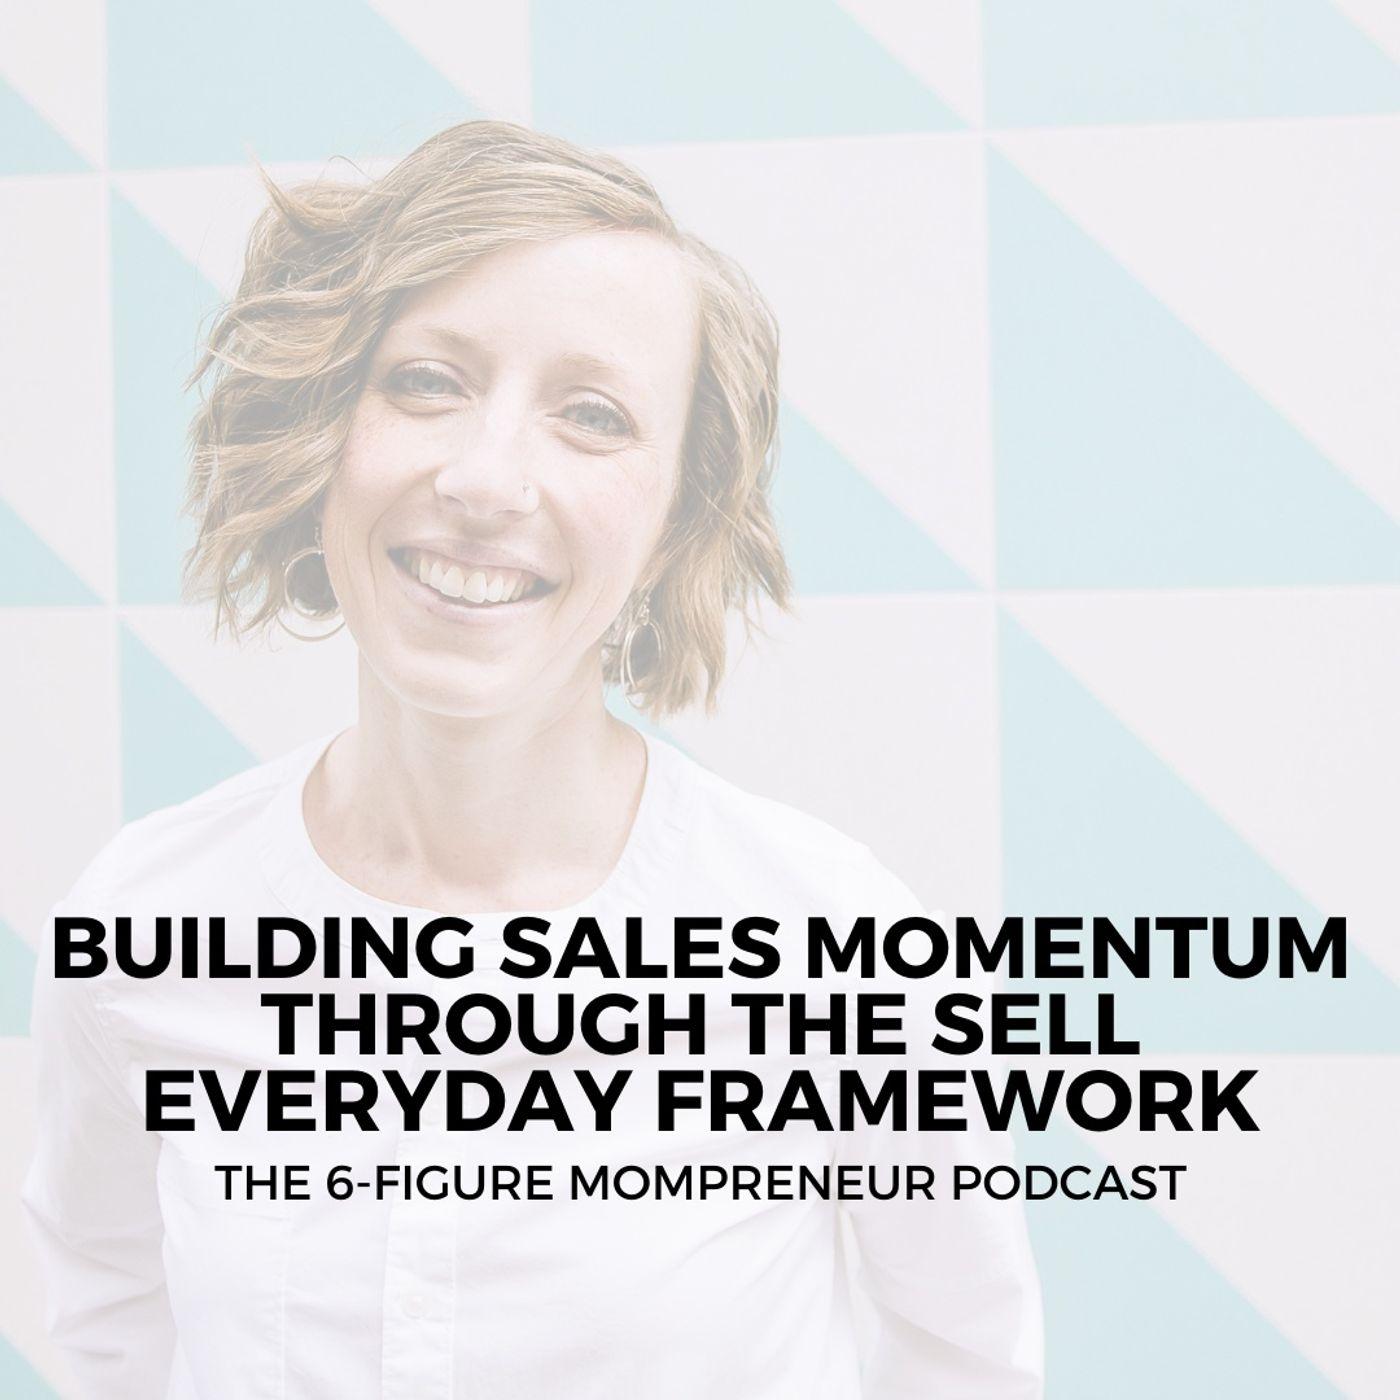 Building sales momentum through the Sell Everyday Framework